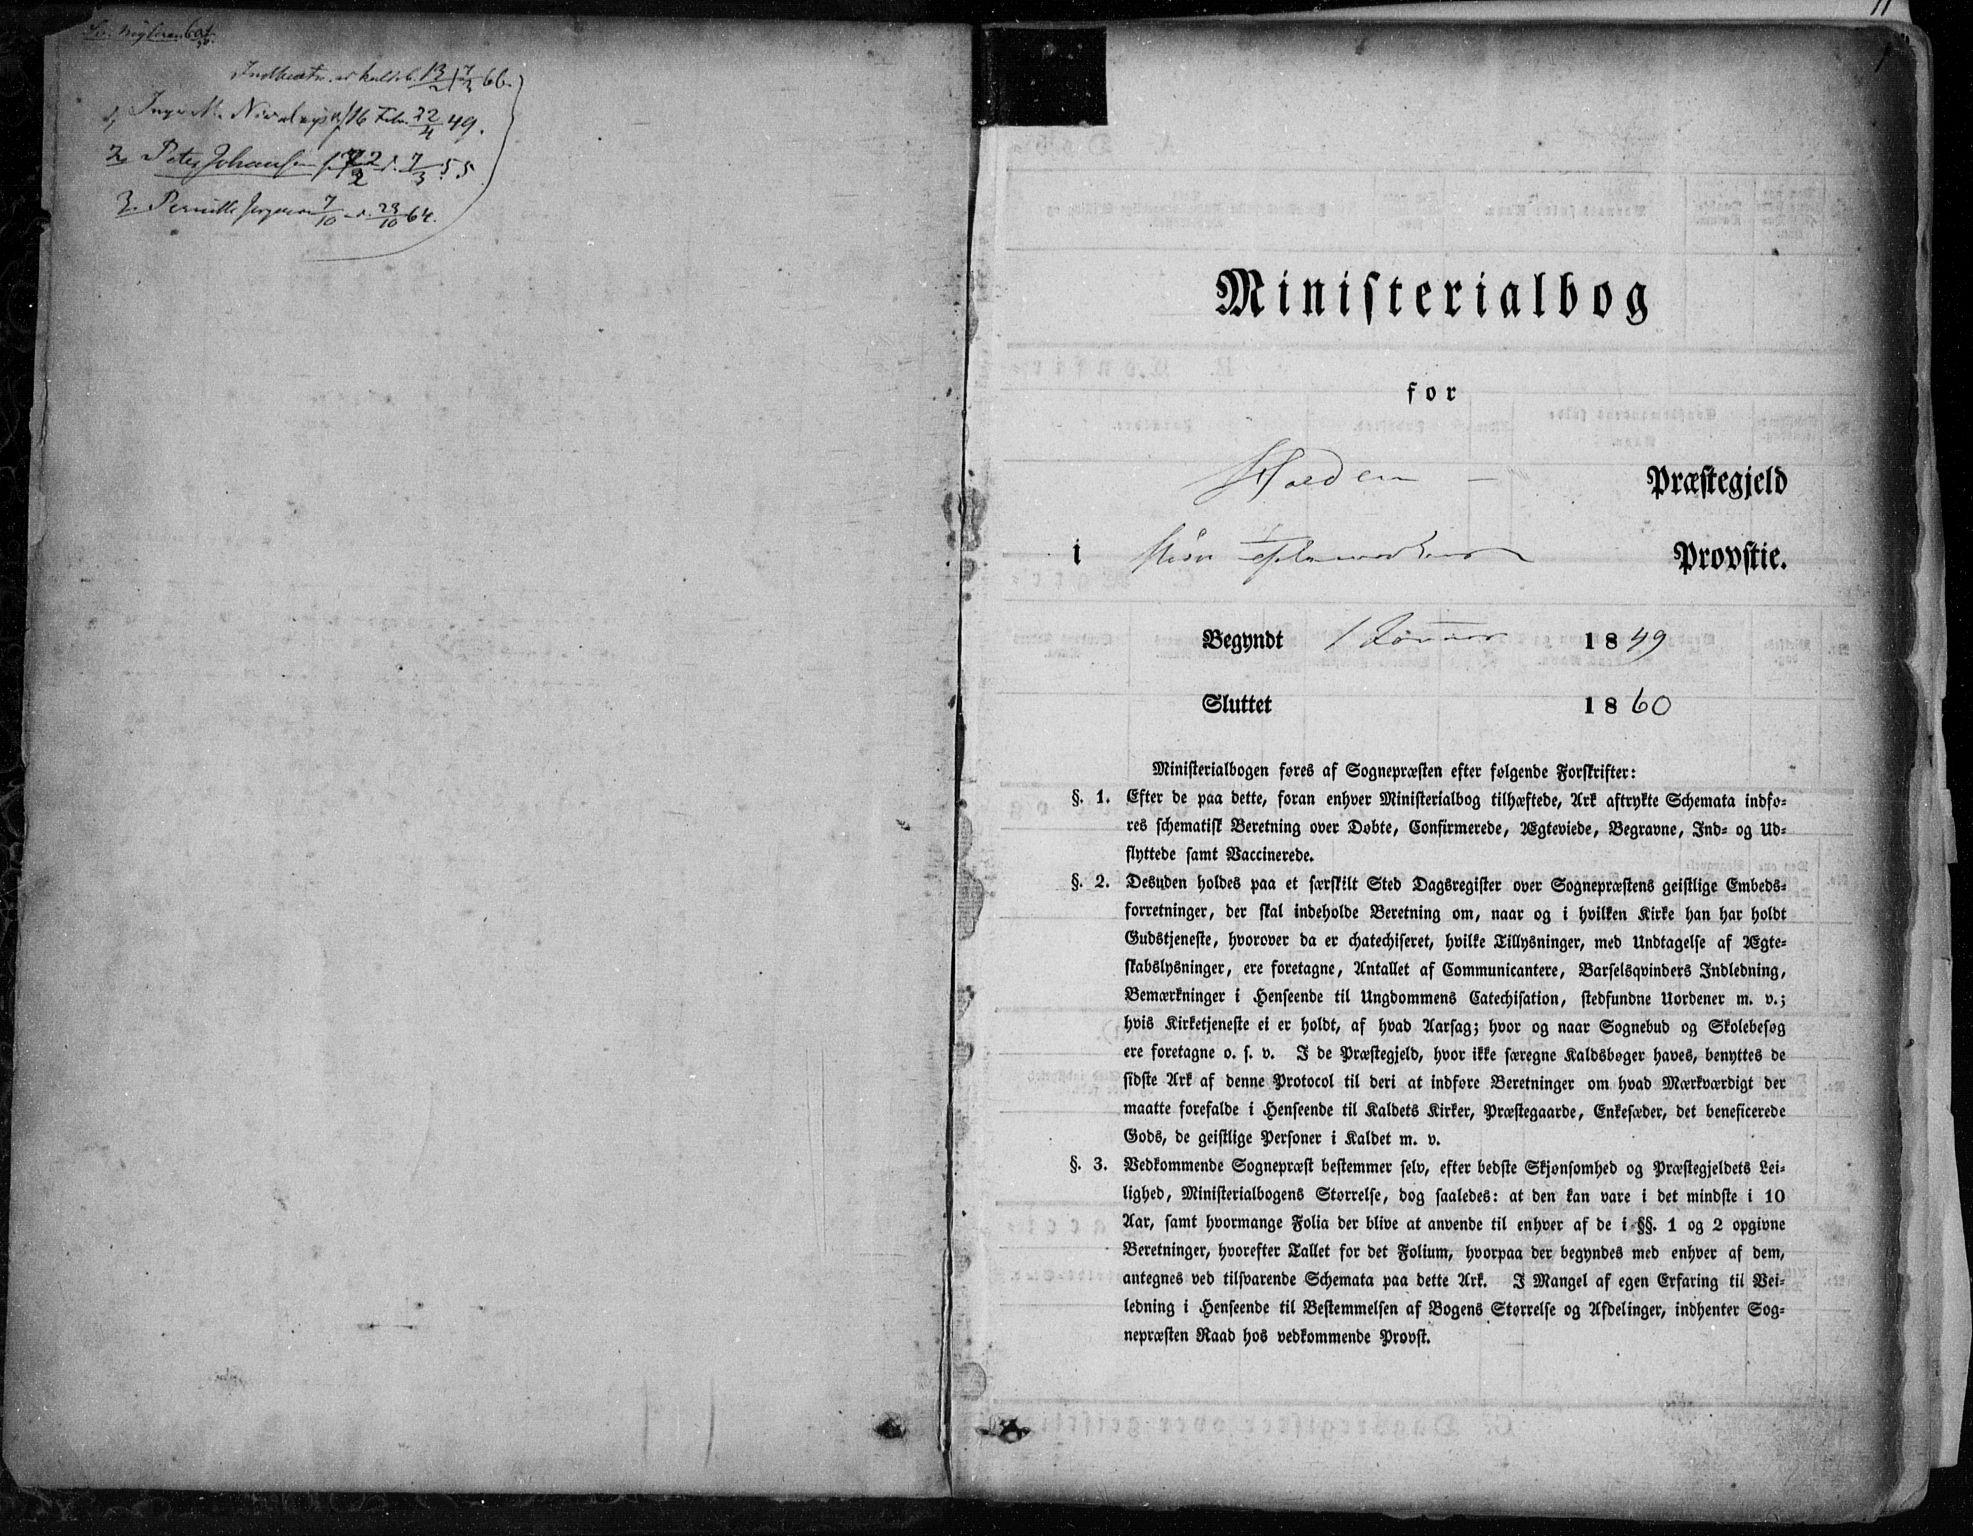 SAKO, Holla kirkebøker, F/Fa/L0005: Ministerialbok nr. 5, 1849-1860, s. 1